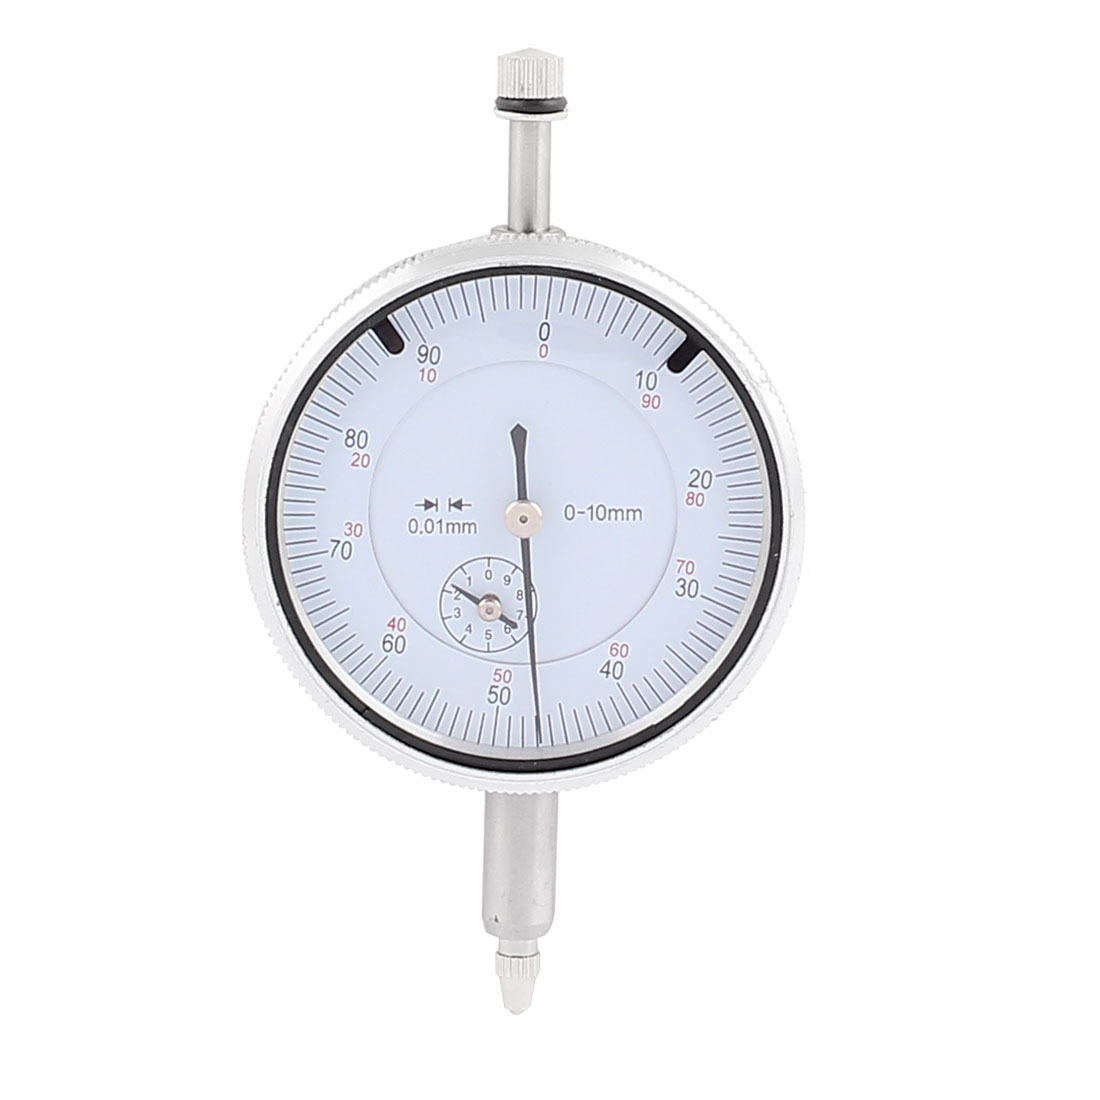 0-10mm Range Measurement Instrument Dial Indicator Gauge Precision Tool A-04